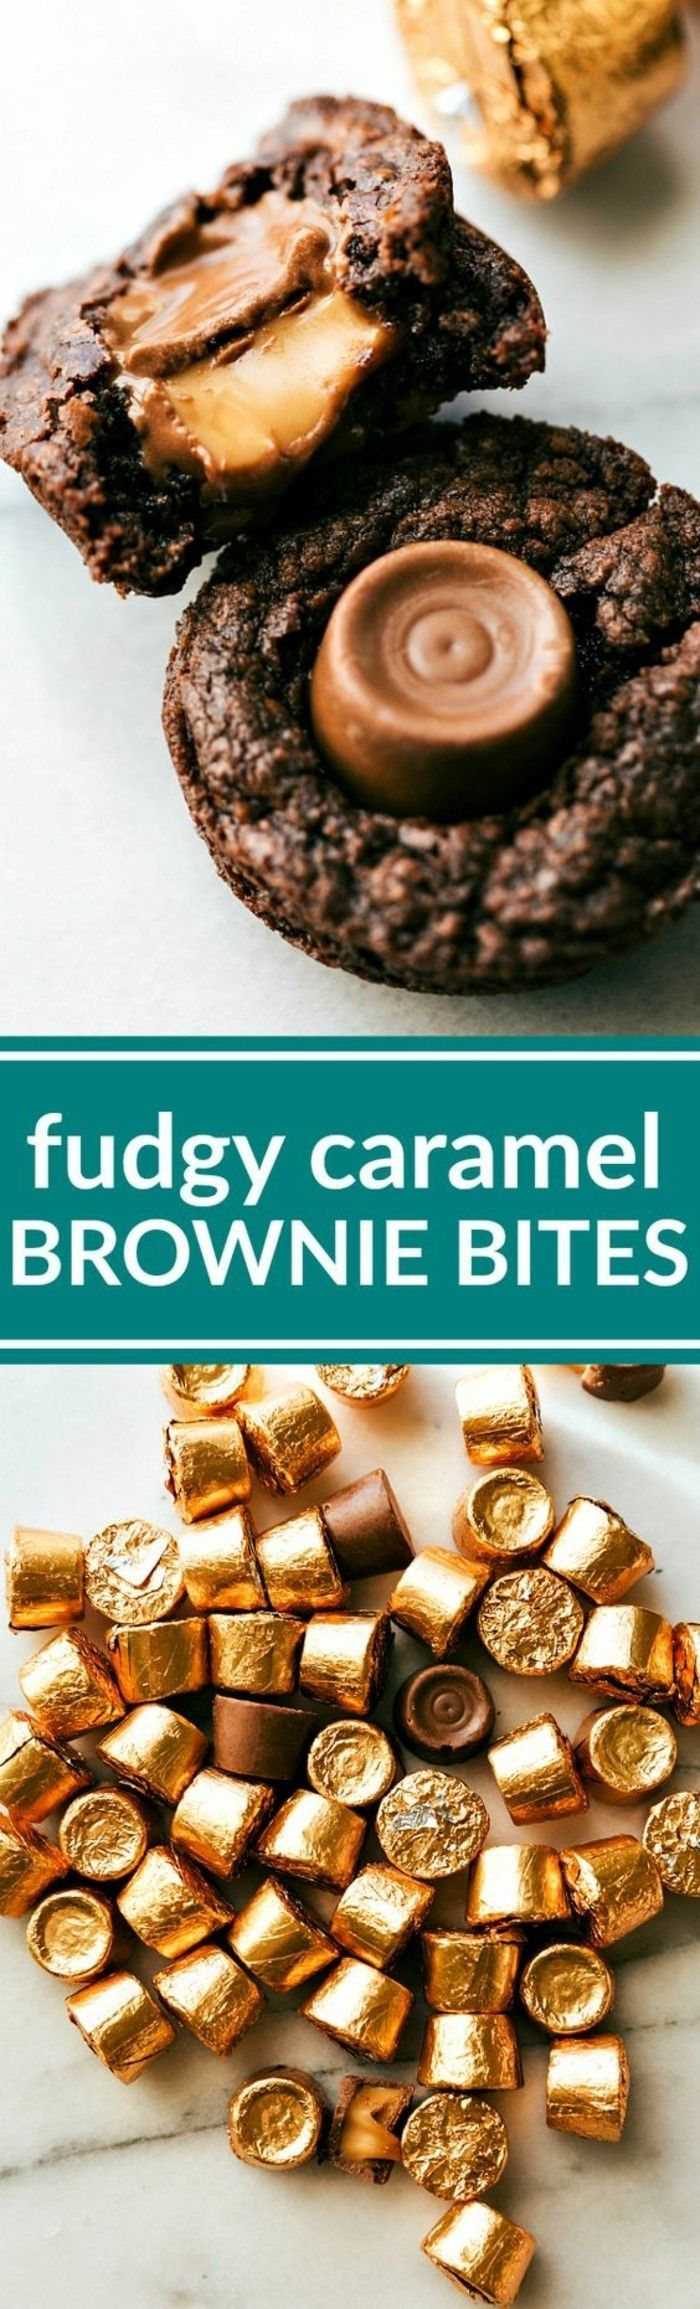 recette-caramel-facile-brownies-au-caramel-desserts-sains